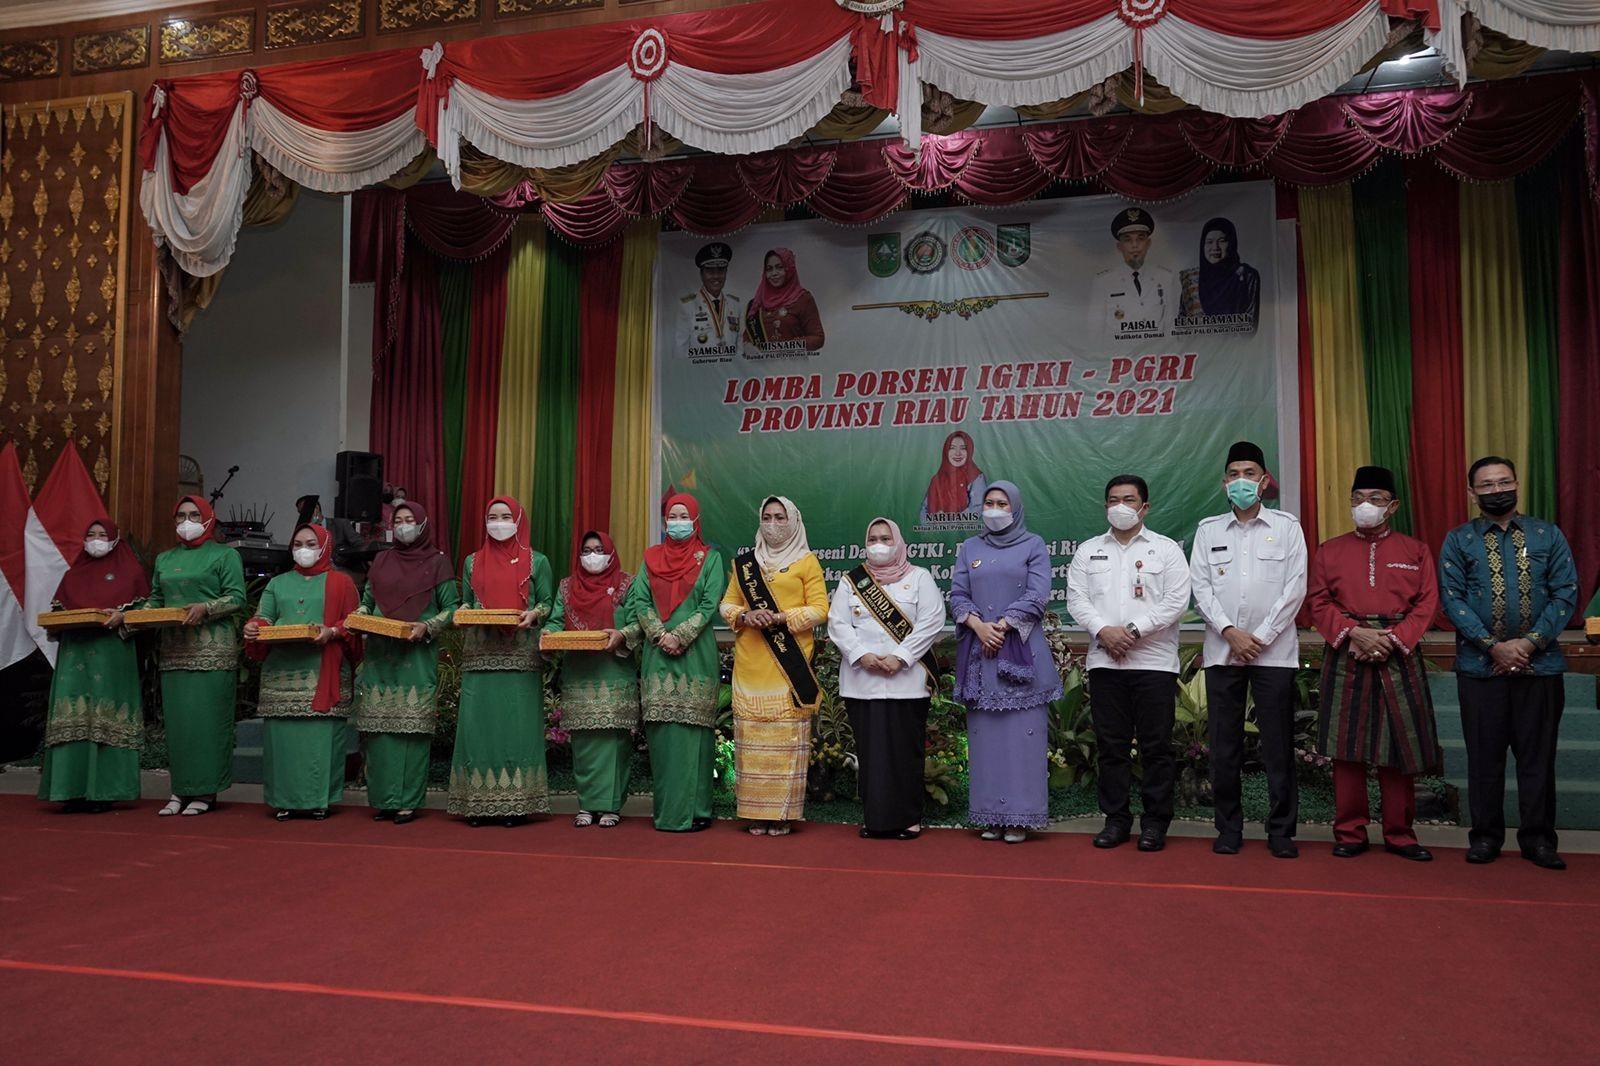 Bupati Inhil H.M.Wardan Bersama Bunda PAUD Hj.Zulaikhah Wardan Porseni IGKT Se-Provinsi Riau TH 2021